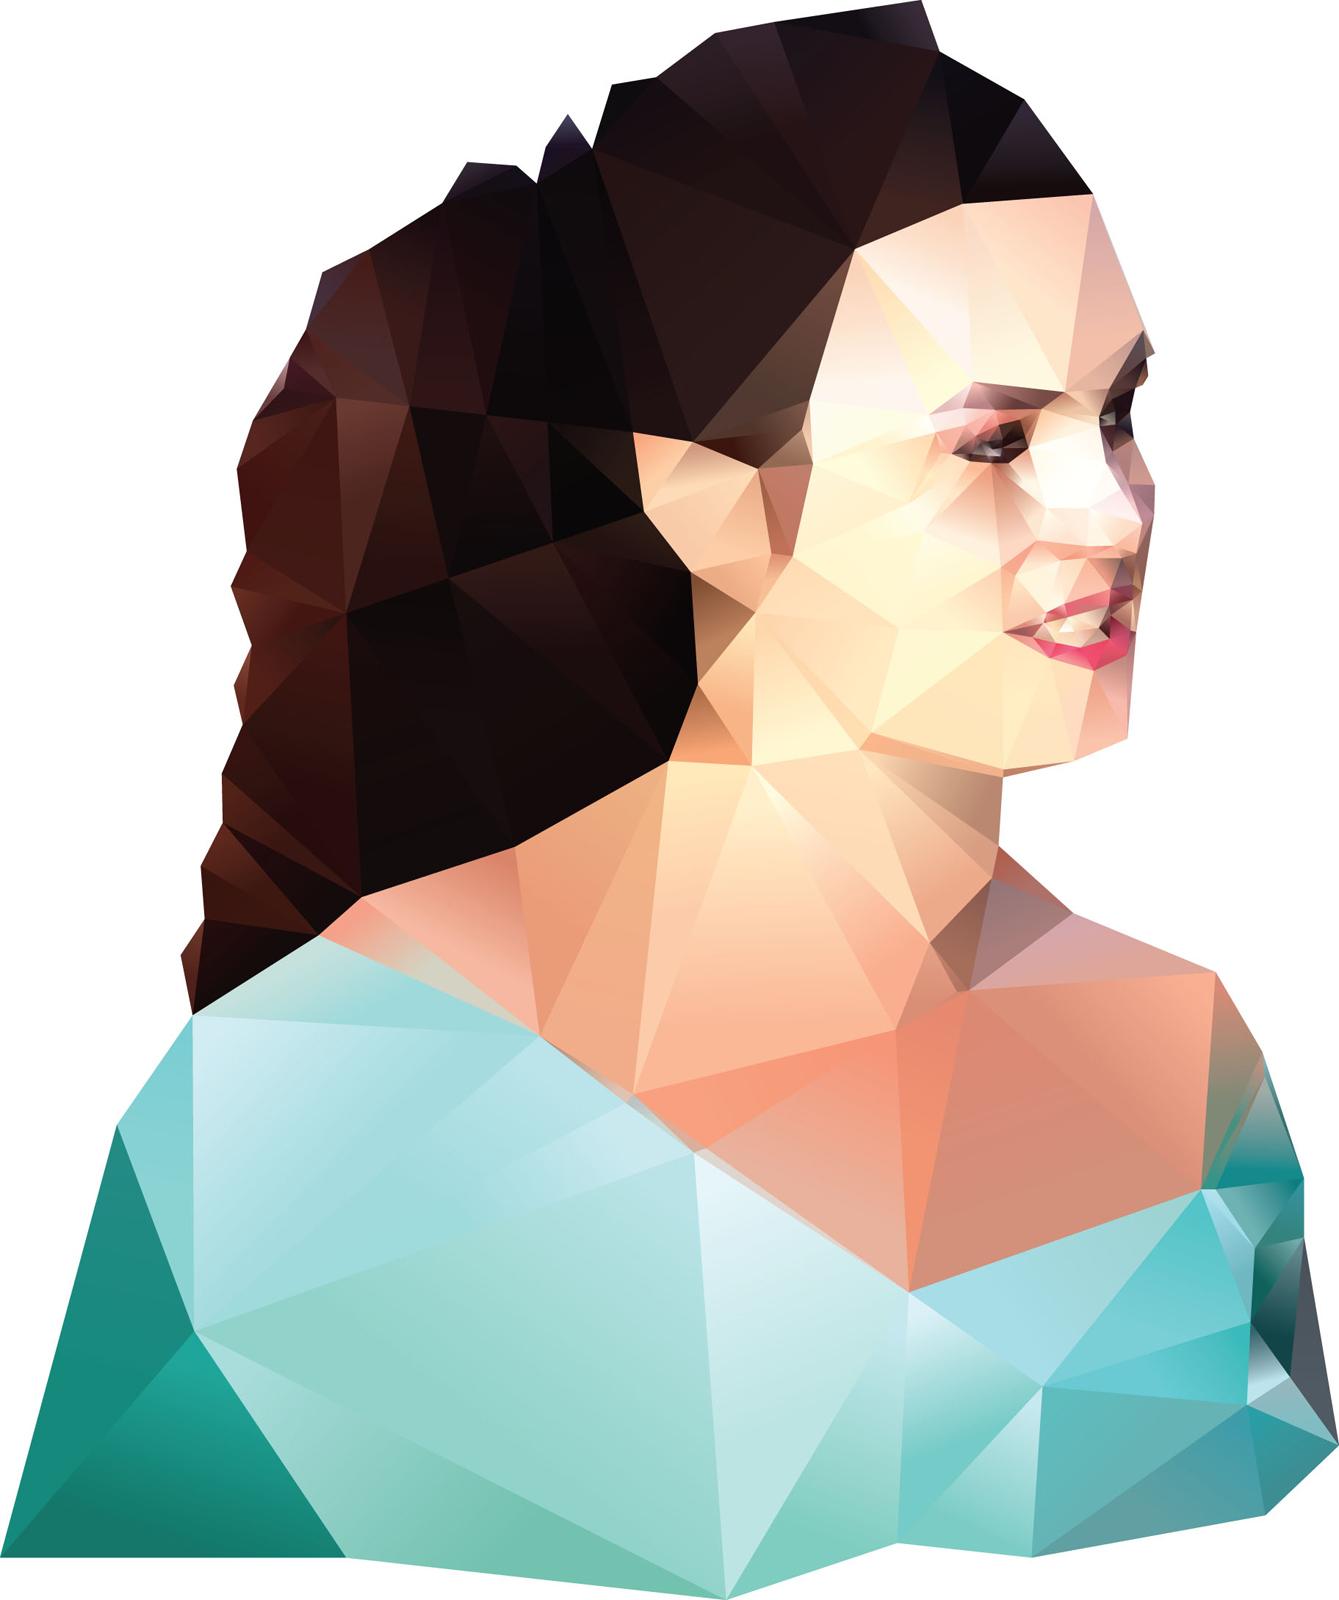 Eva Franch i Gilabert illustration by Jonathan Puckey